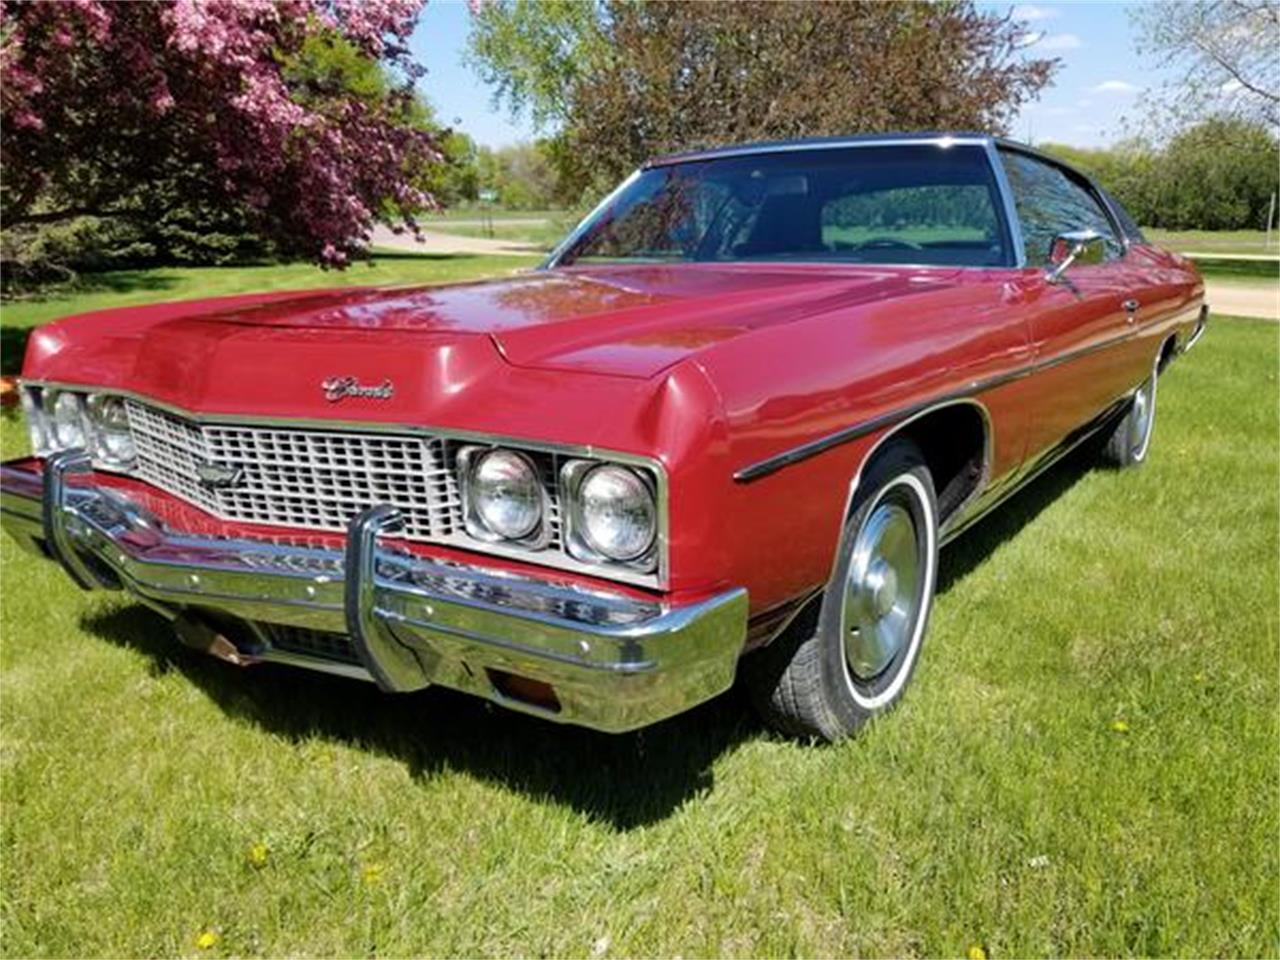 1973 Chevrolet Impala (CC-1361992) for sale in New Ulm, Minnesota